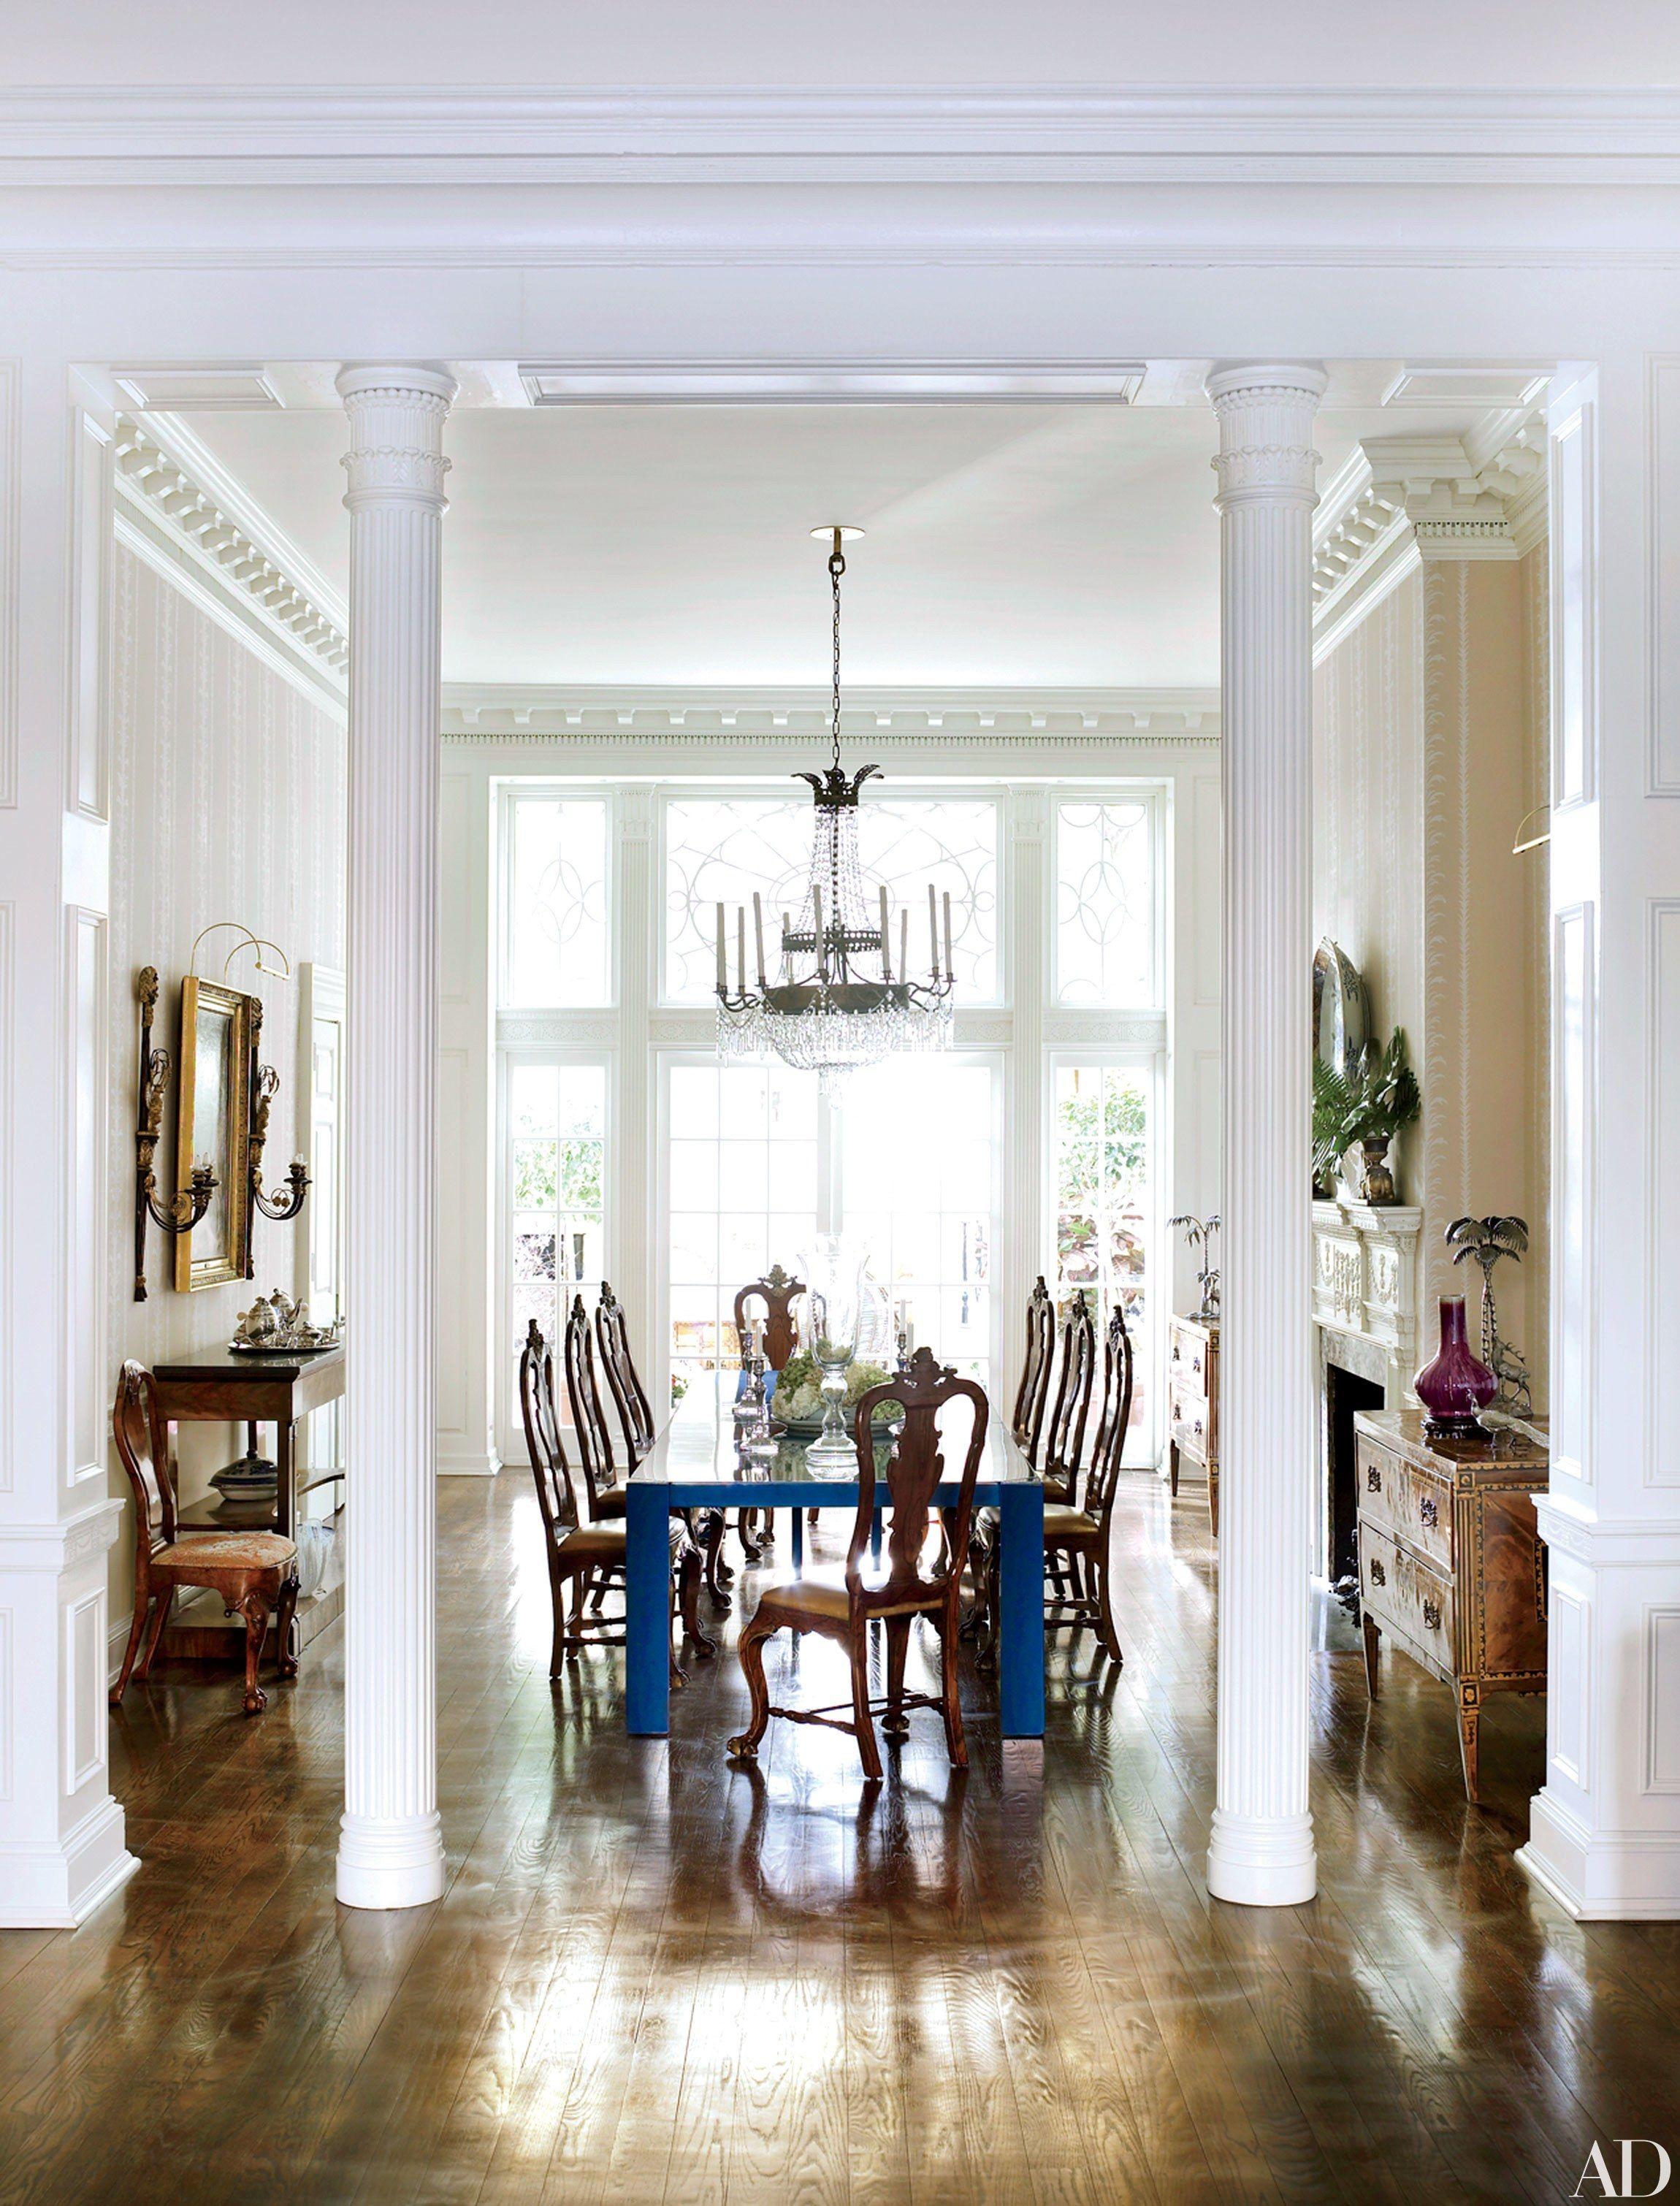 8 Homes With Grand Interior Columns  Interior Columns Prepossessing Dining Room Empire Design Ideas